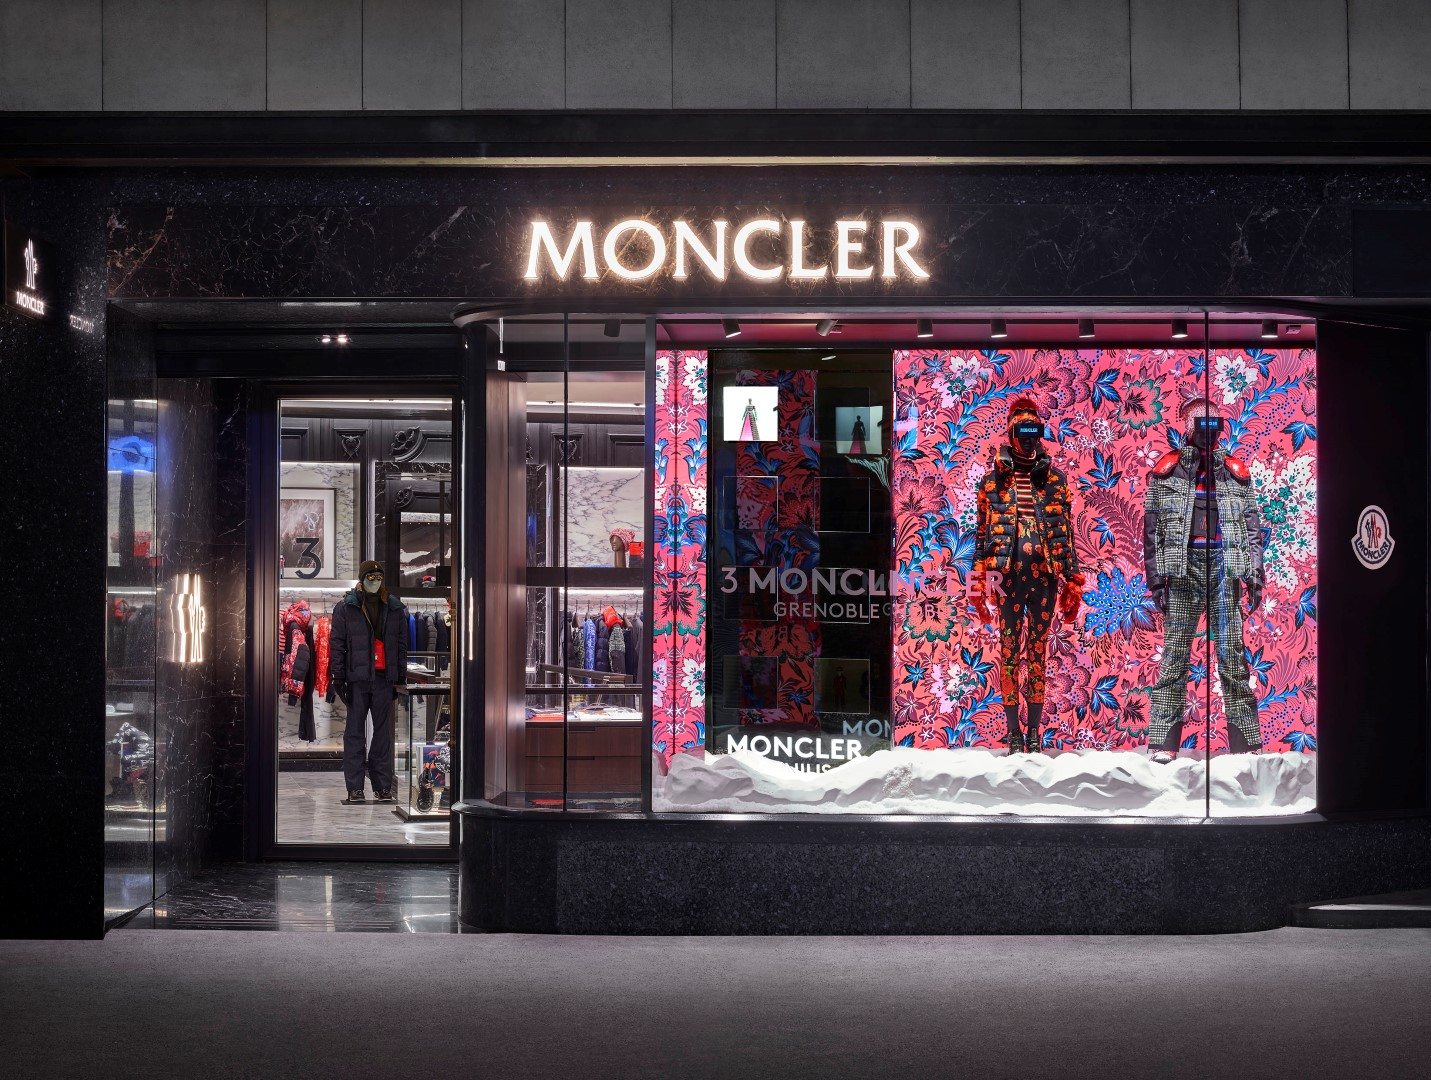 Moncler boutique Svizzera Lucerna